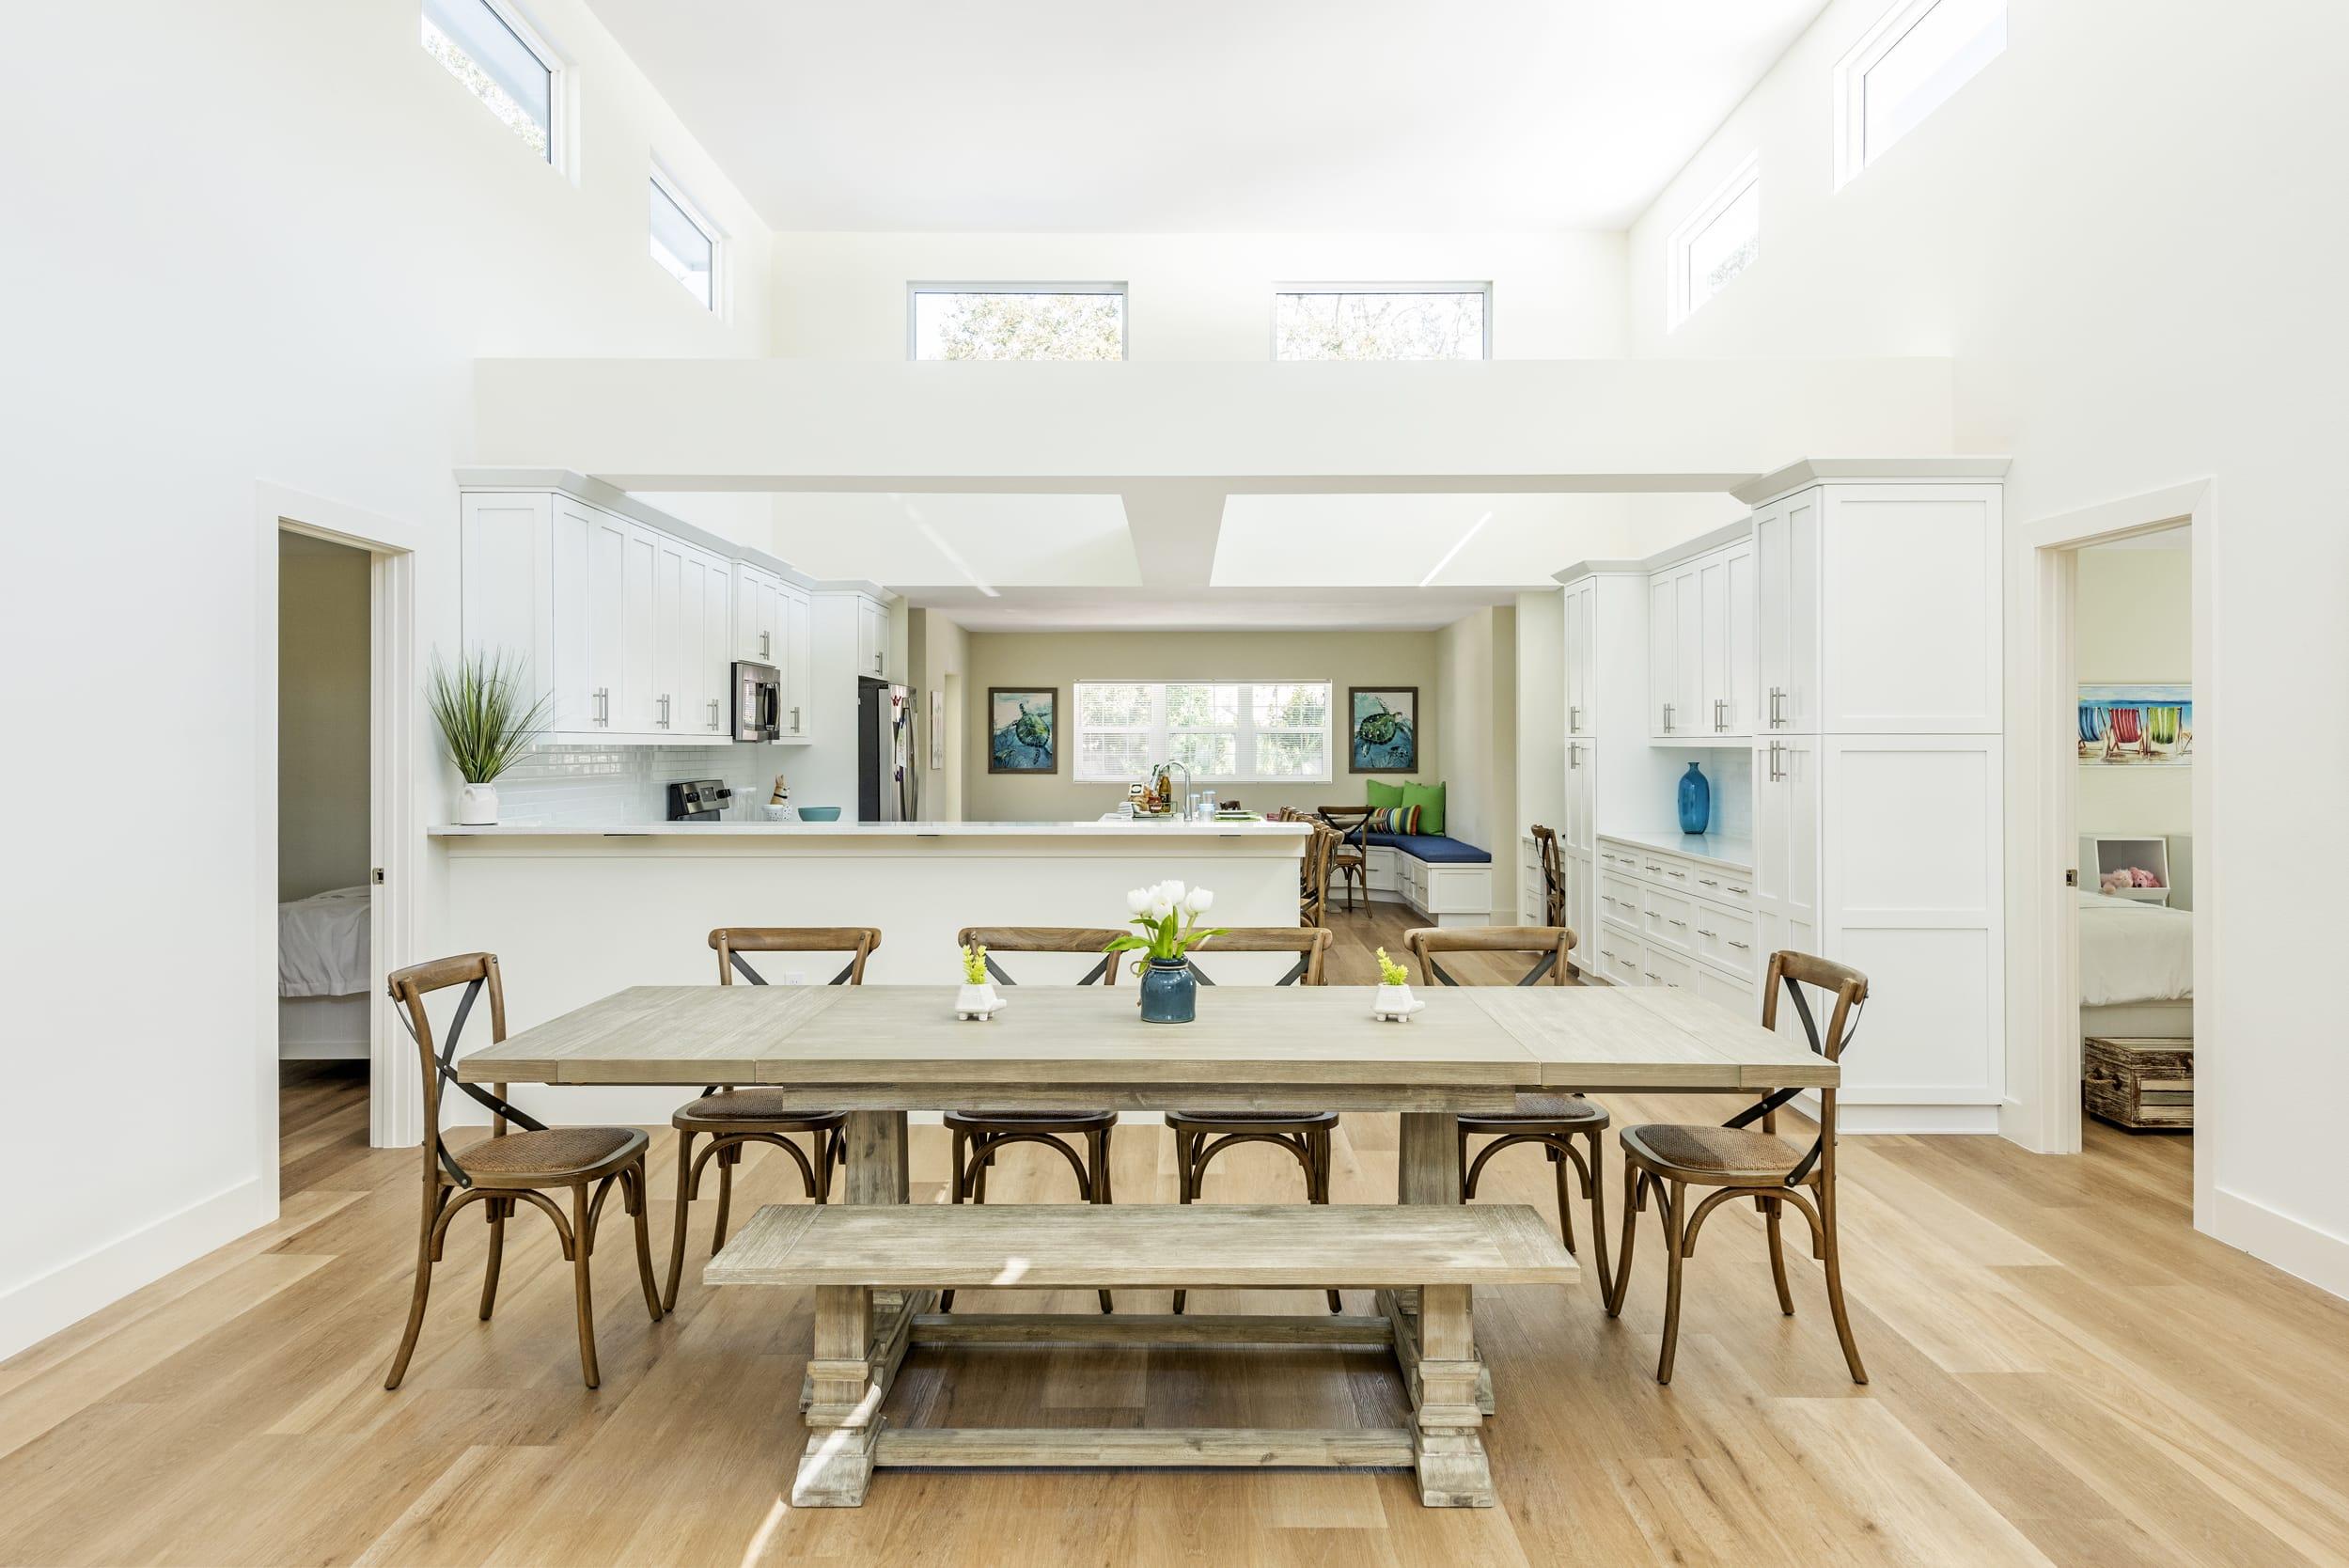 Wood Dinning Table Bench Floors Blue Glass Vase